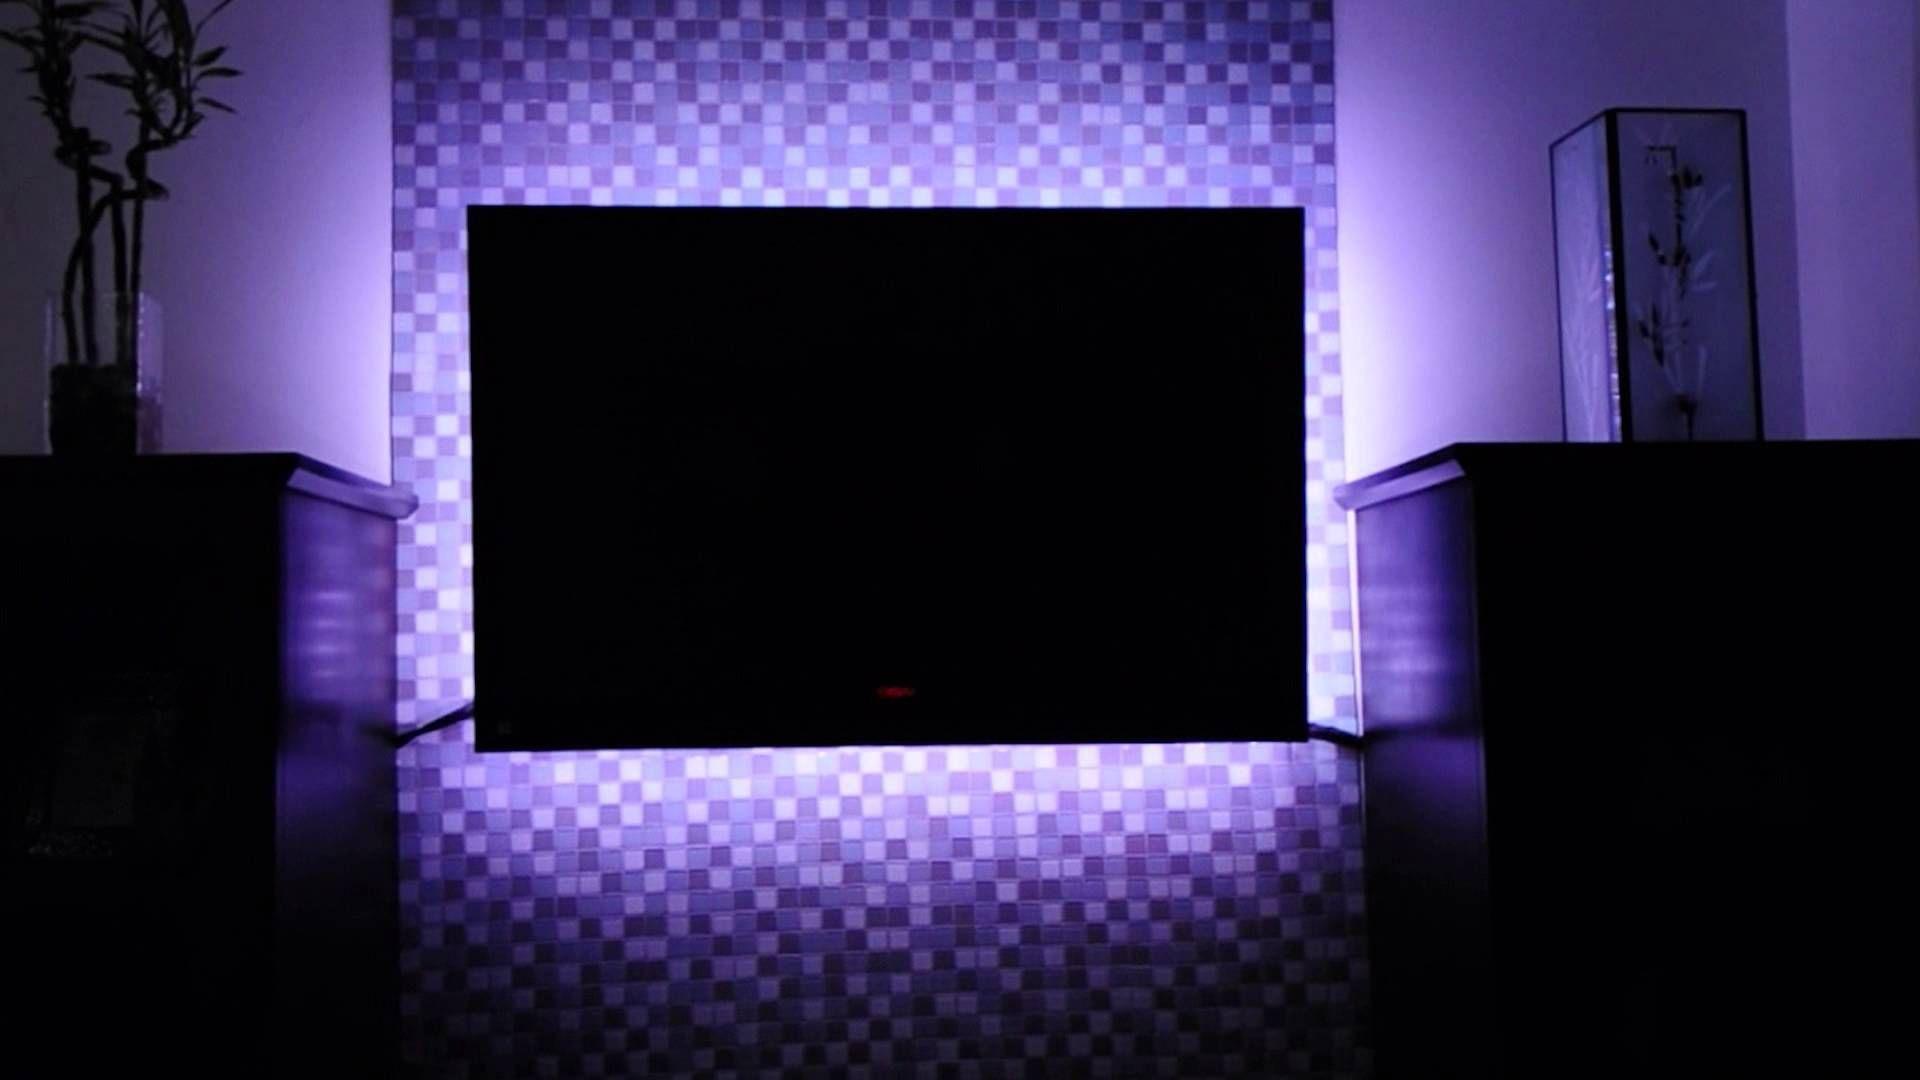 Cool Idea Led Lighting Behind A Tv To Reduce Eye Strain Lights Behind Tv Led Living Room Lights Tv Backlight